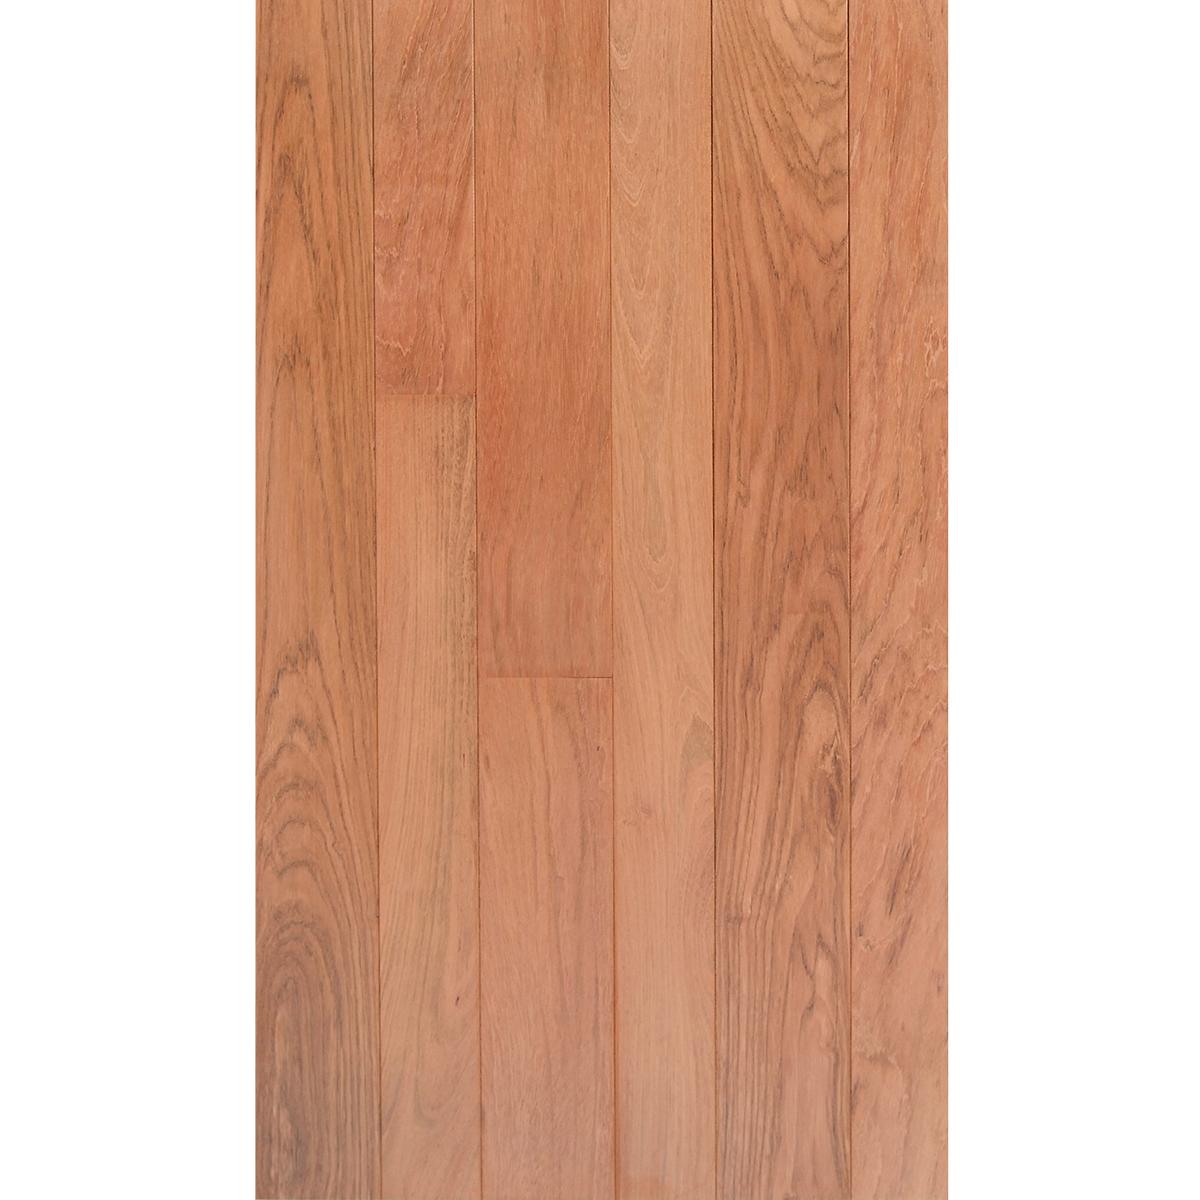 "Brazilian Cherry 3/4"" x 3"" & 4"" Select Grade Flooring"